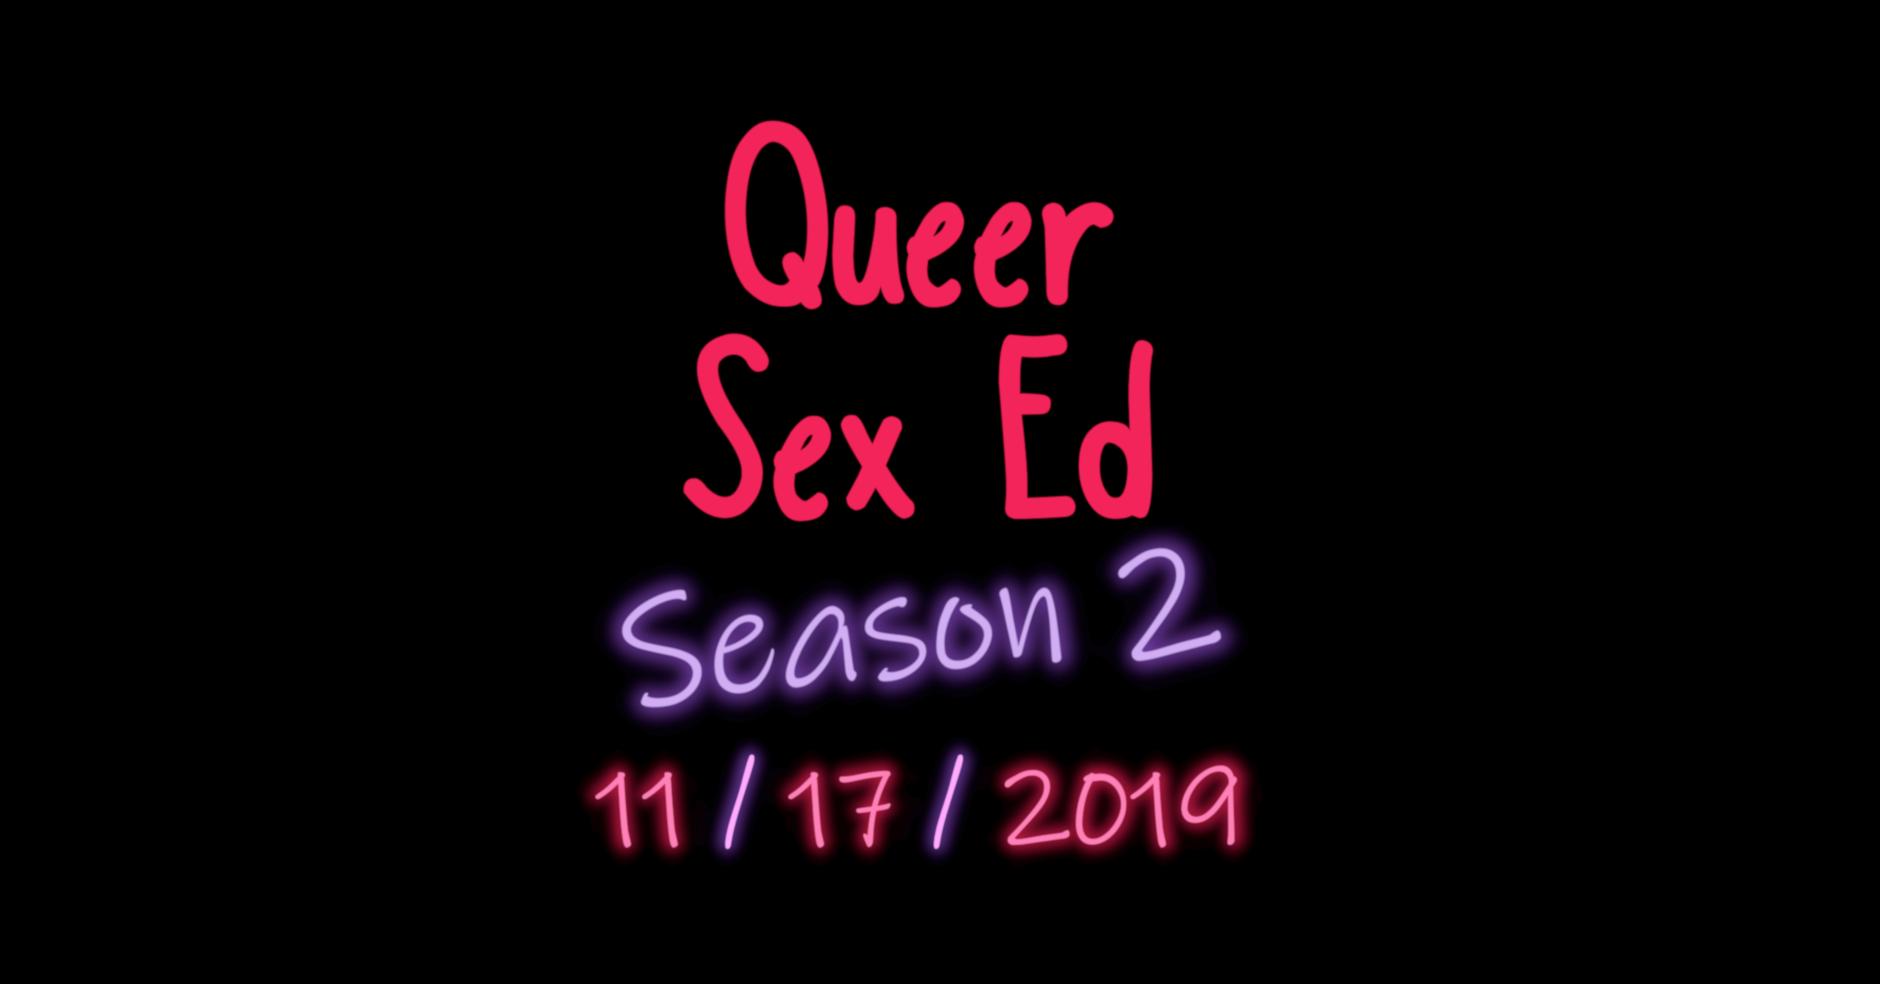 Season 2 FB image.png